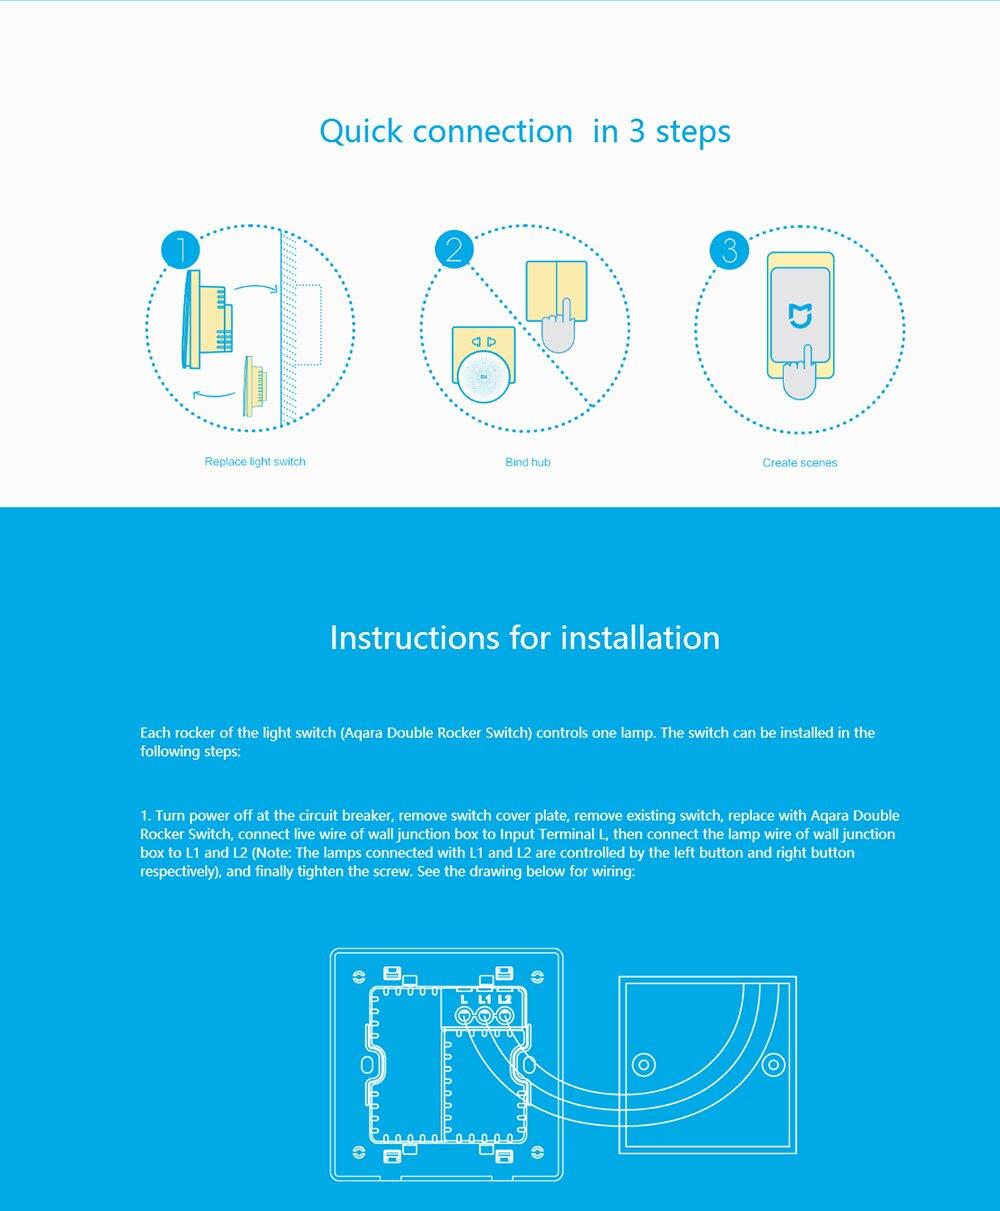 Xiaomi Aqara Smart Home Light Switch Zigbee Wireless Wall Via Led Pwm Tubelight Circuit Atomizer Coil Temperature Controller Usd 4799 5039 Piece